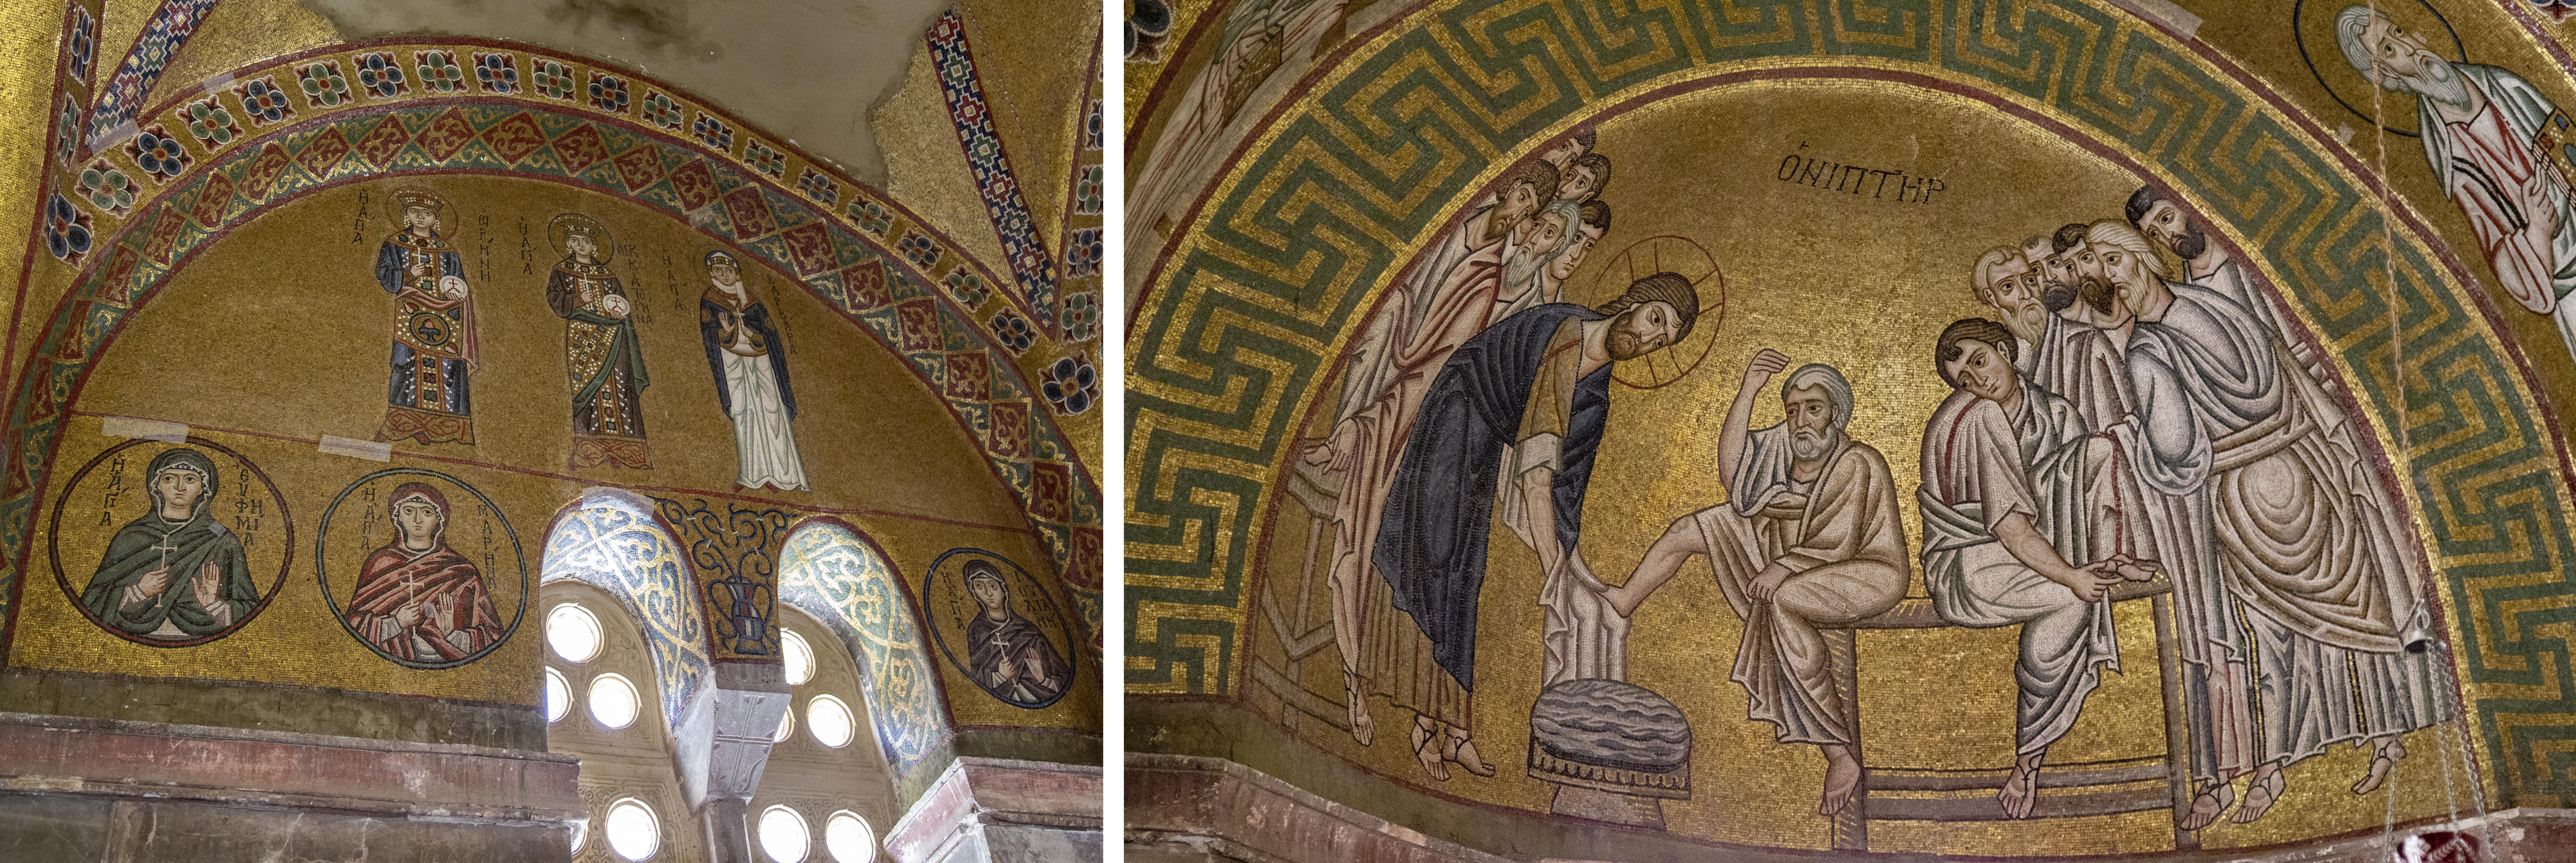 Narthex mosaics, left: a group of women saints, right: Christ washing his disciples' feet, katholikon, Hosios Loukas, Boeotia, 11th century (photo: Evan Freeman, CC BY-SA 4.0)